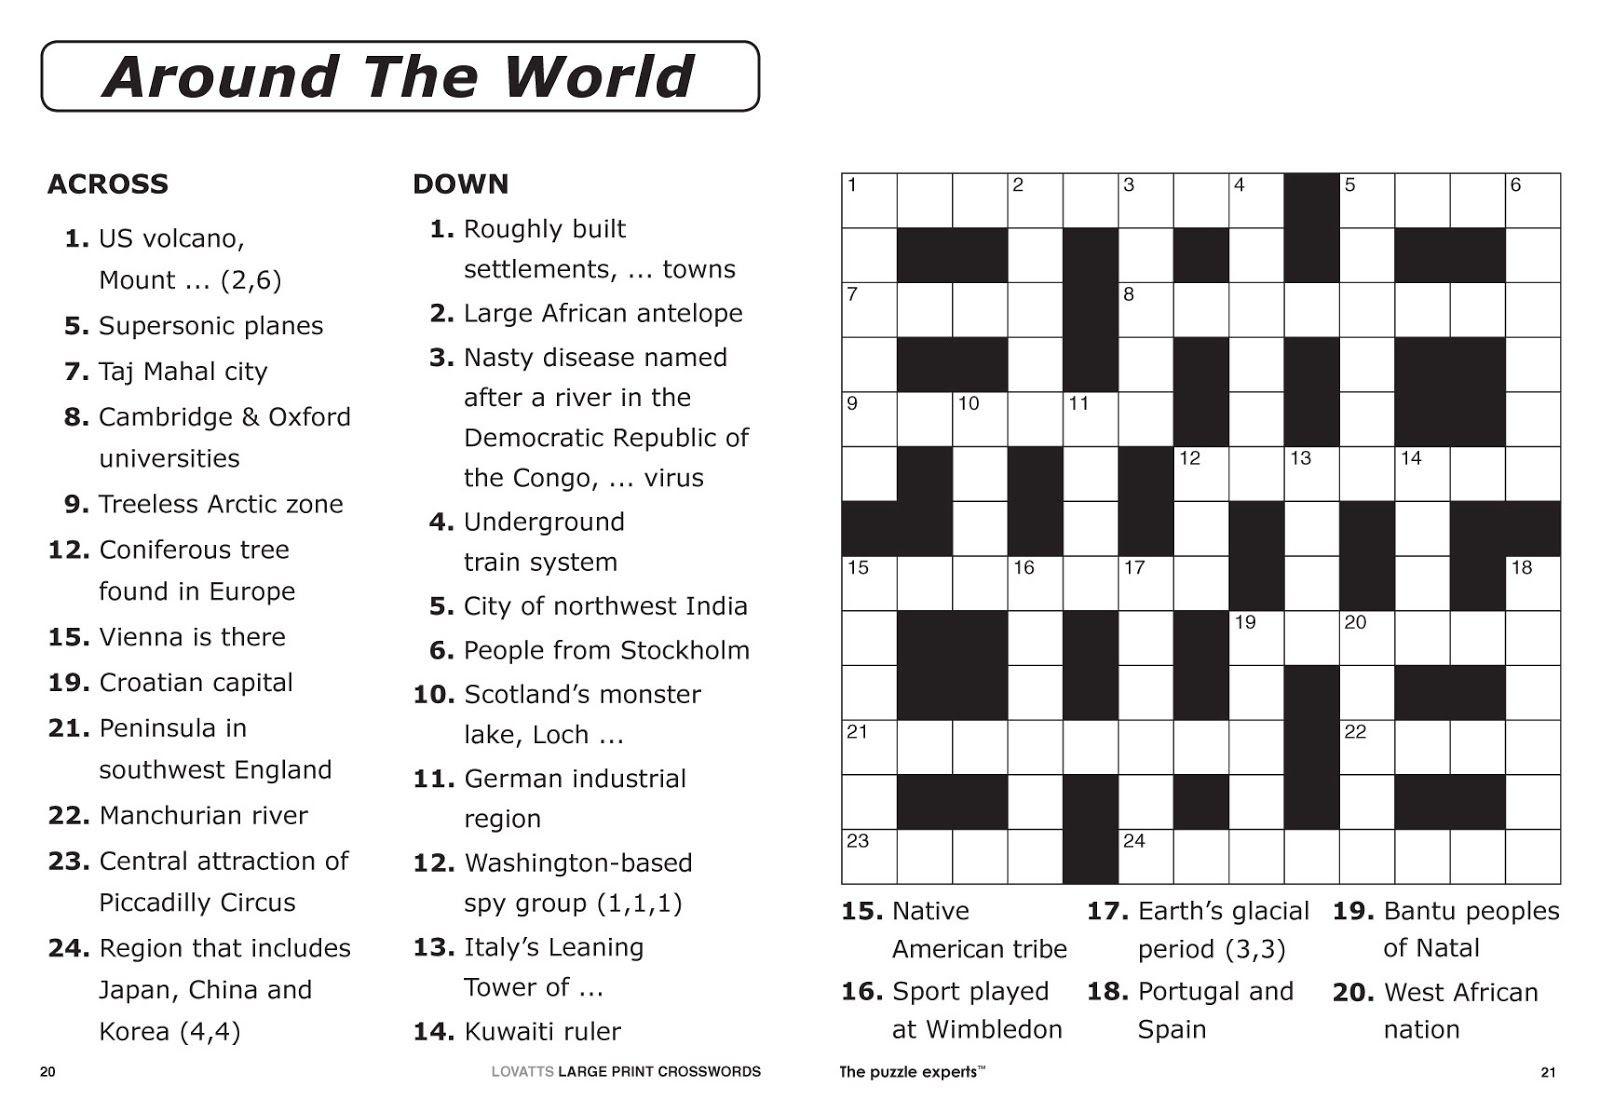 Free Printable Large Print Crossword Puzzles | M3U8 - Free Printable Crossword Puzzles For Adults